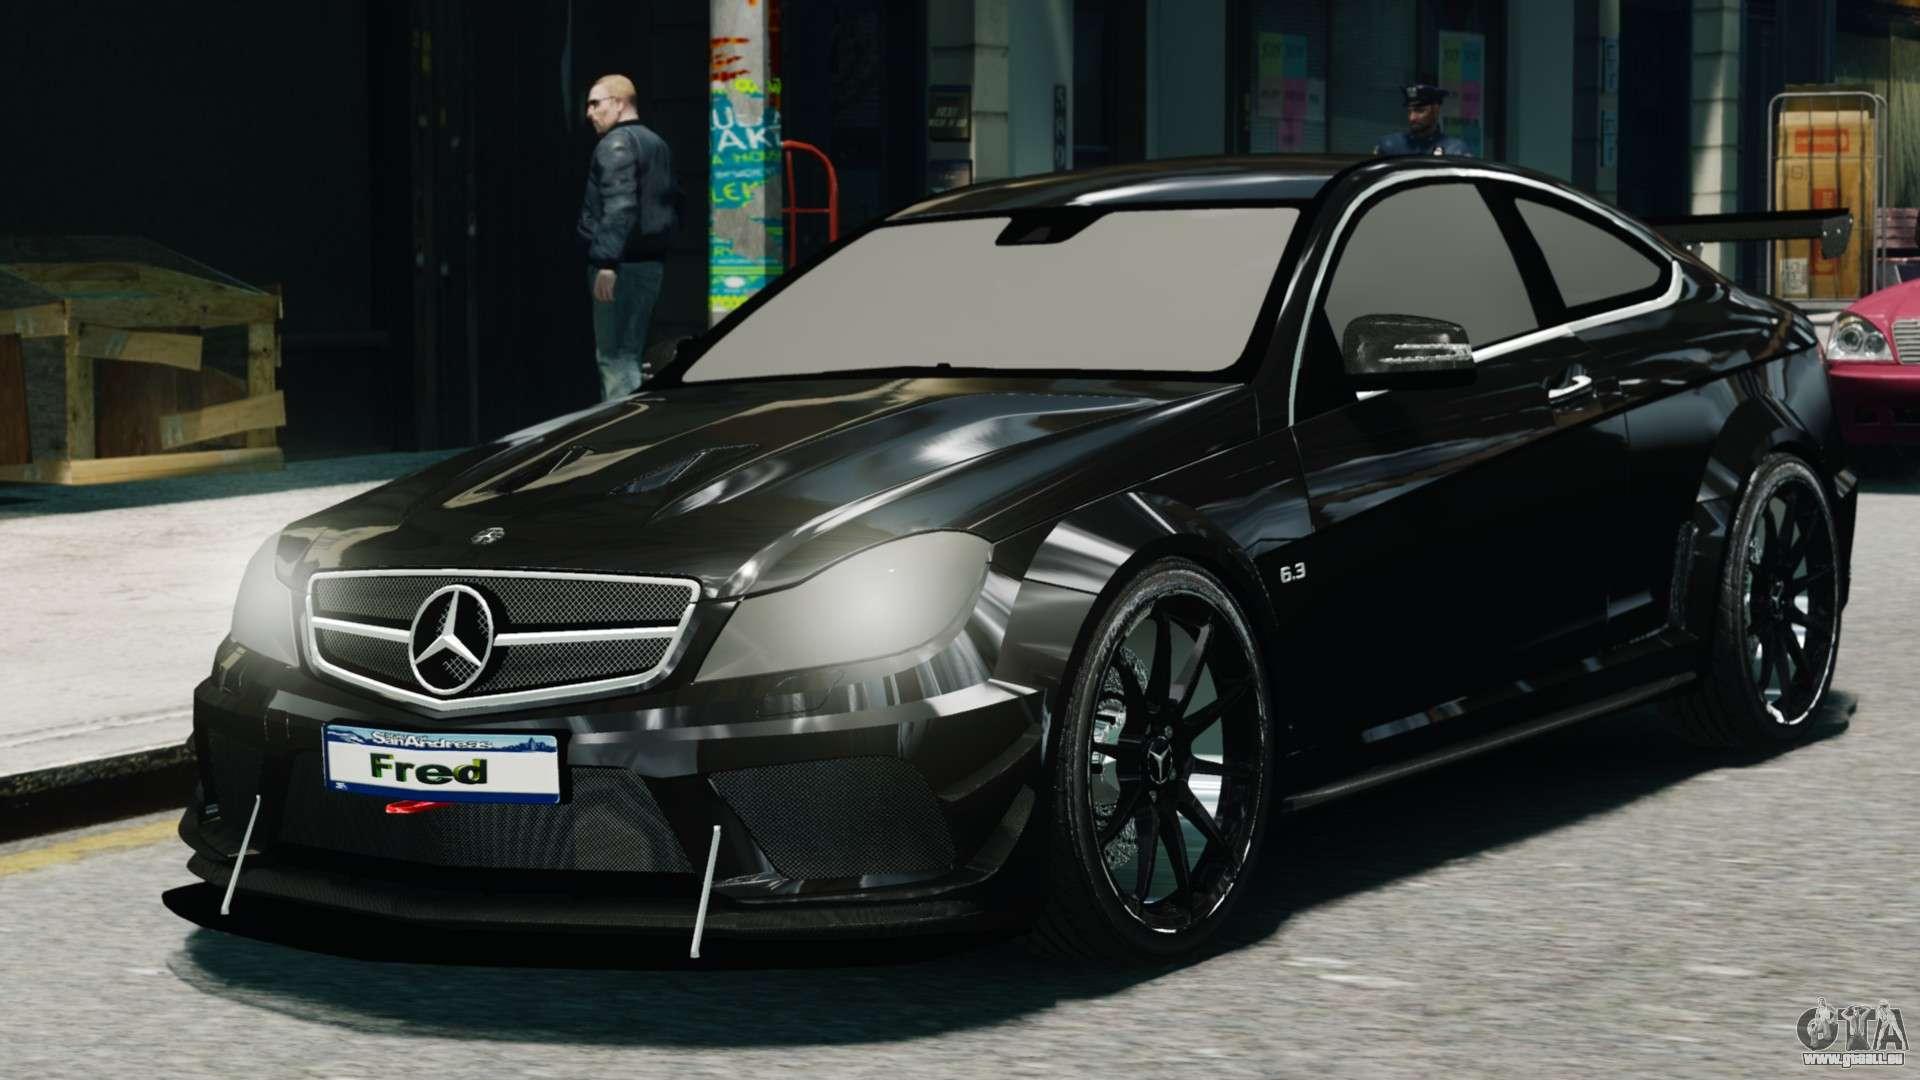 2014 Mercedes Benz C63 Amg